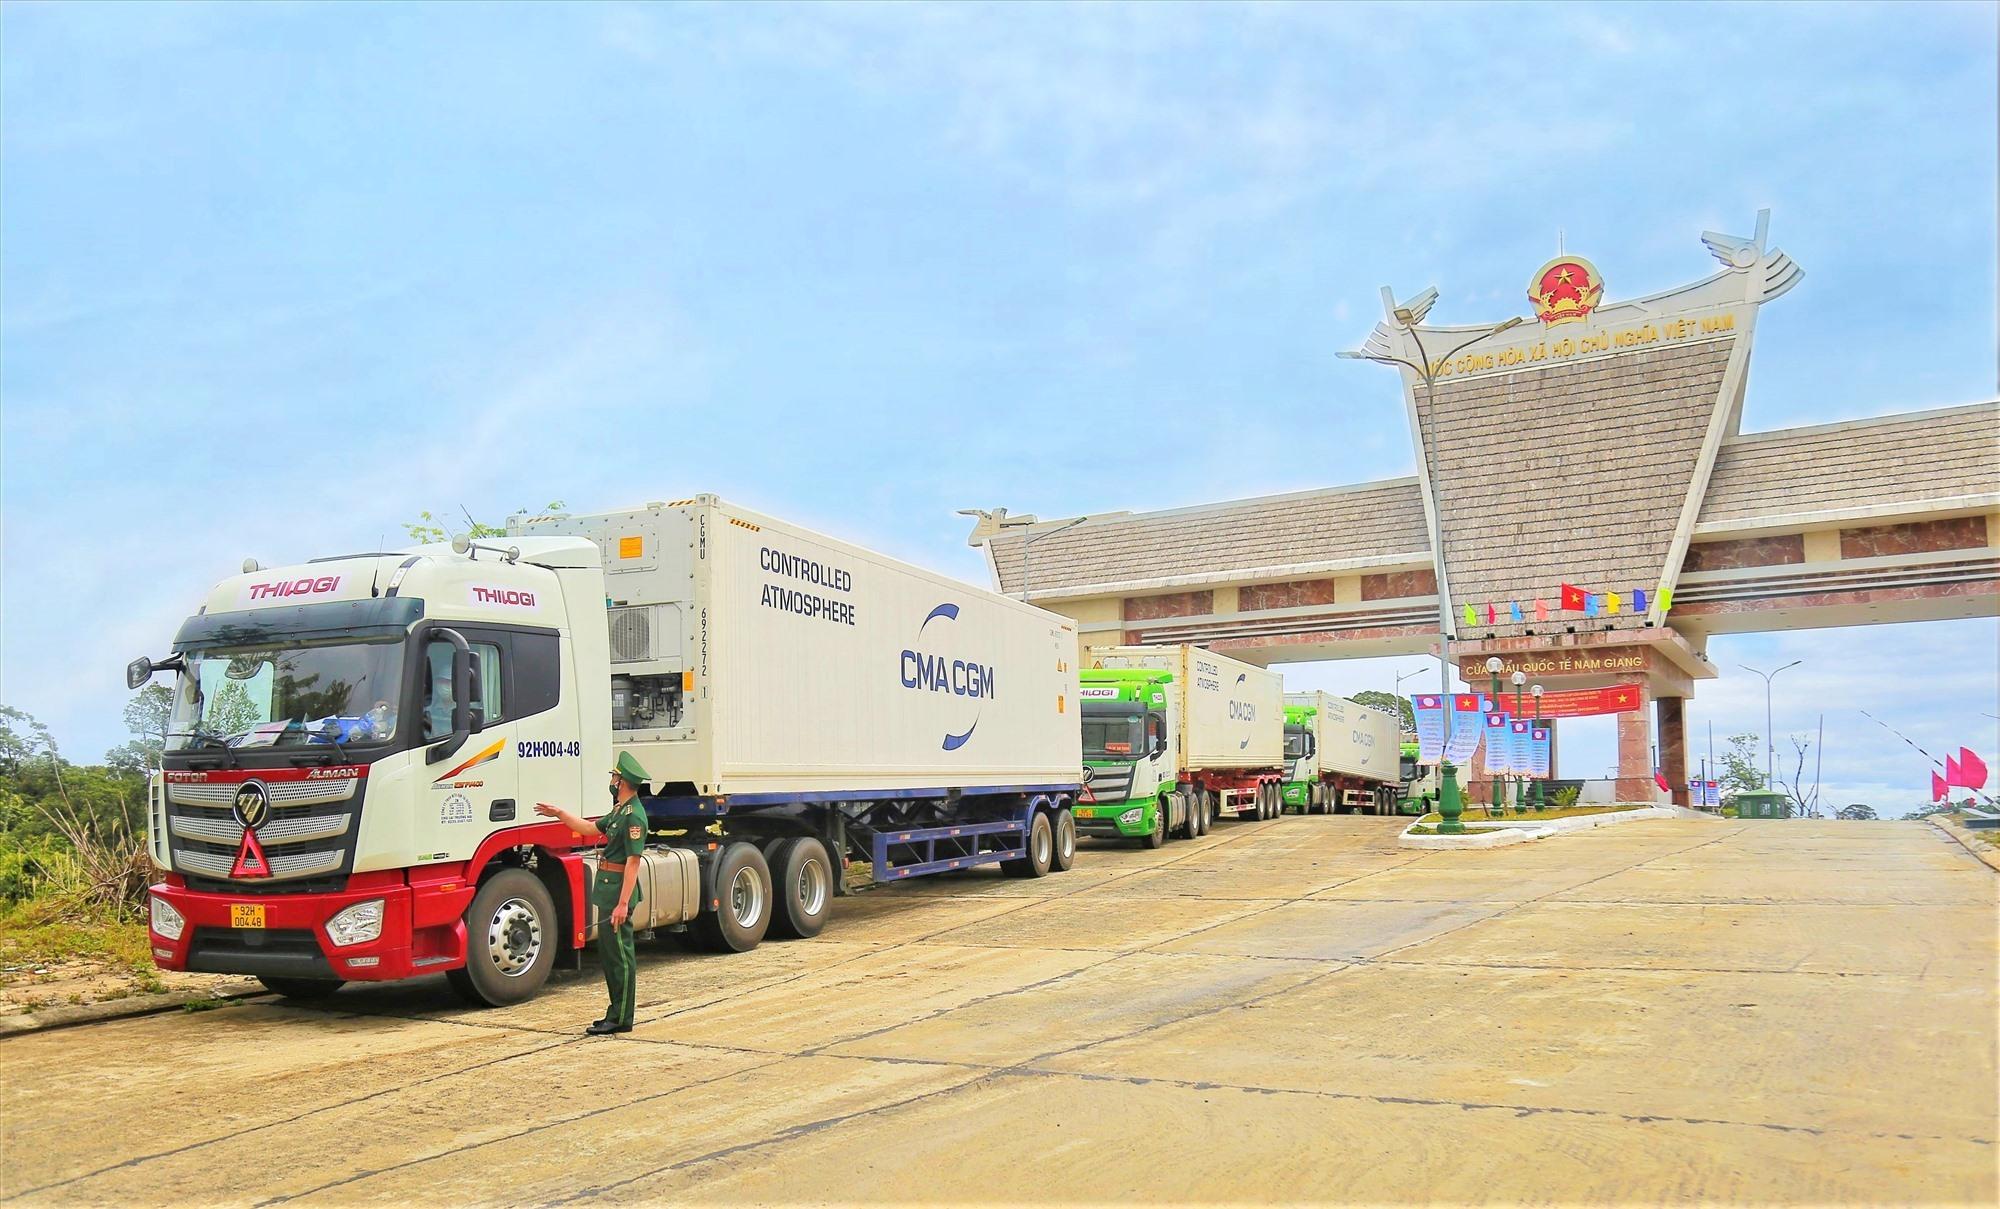 Thilogi's vehicles at Nam Giang- Dak Ta Ook international border gate